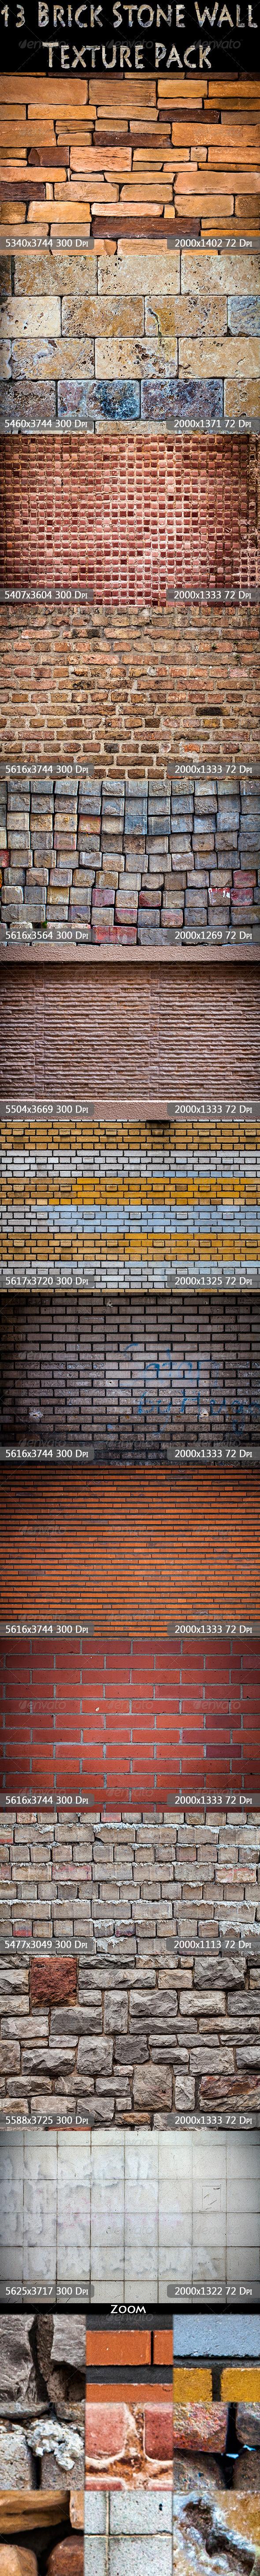 13 Brick Stone Wall Textrue Pack